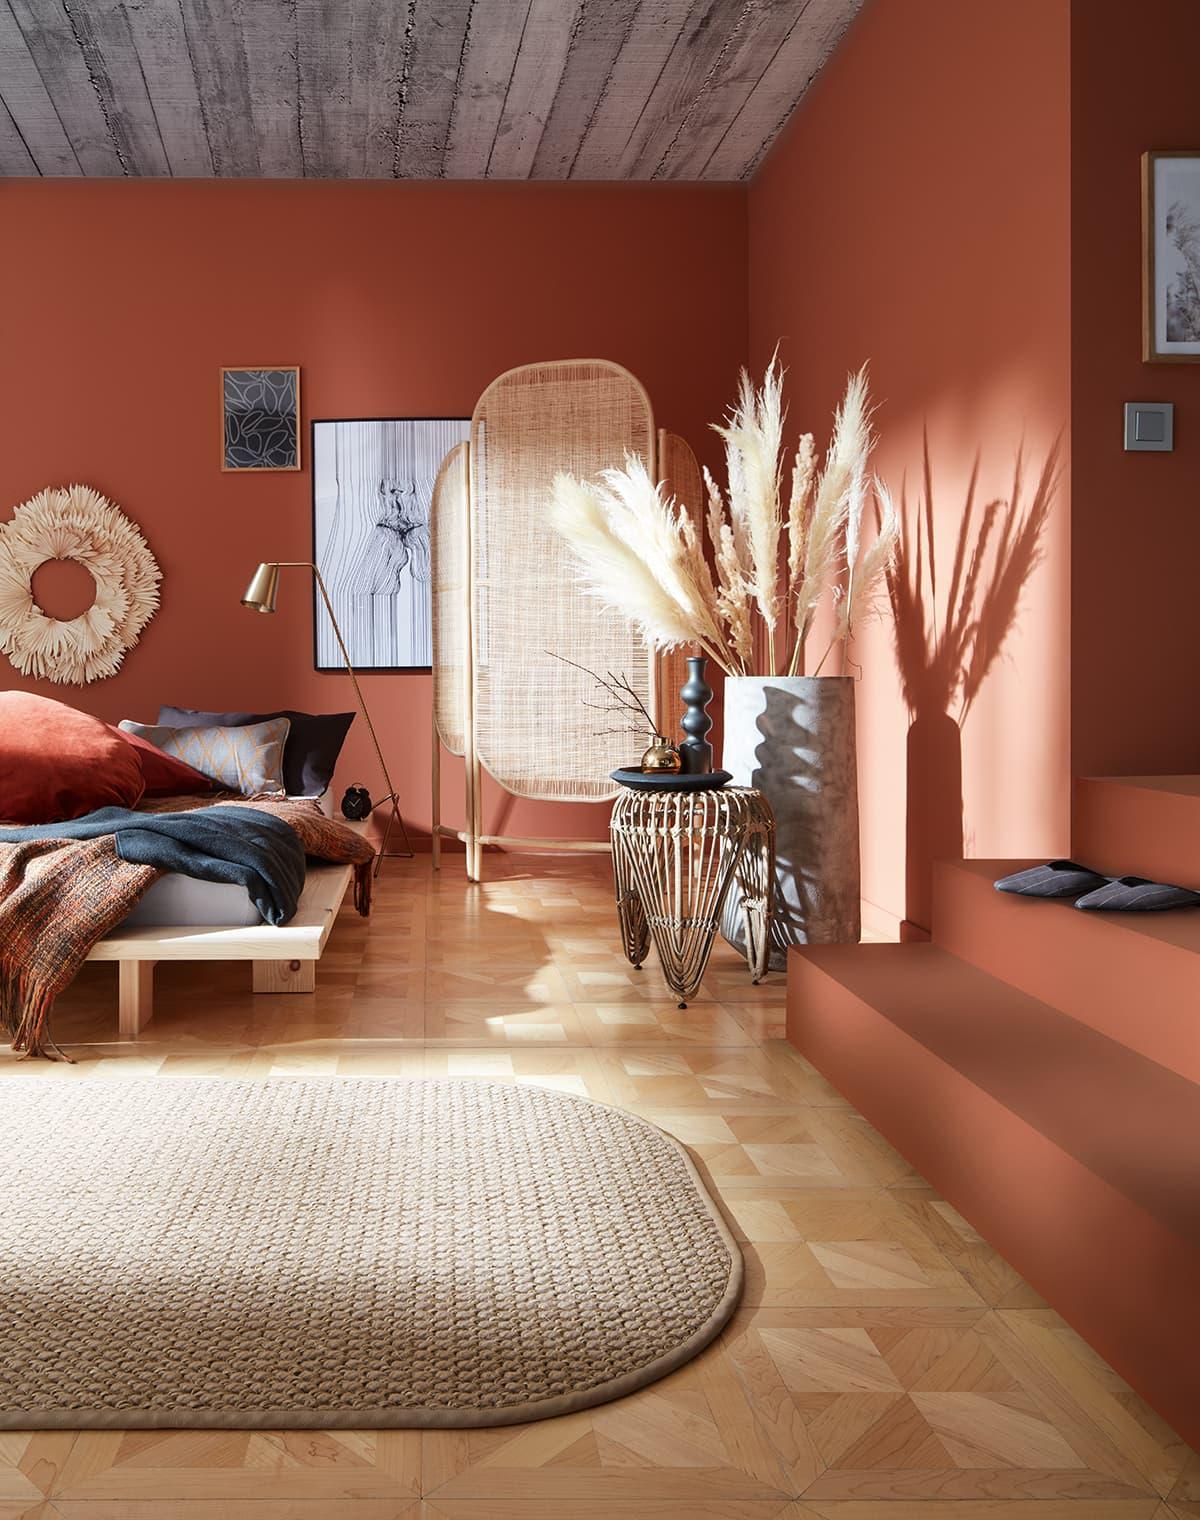 tapis-de-chambre-beige-arrondi-arha-studio